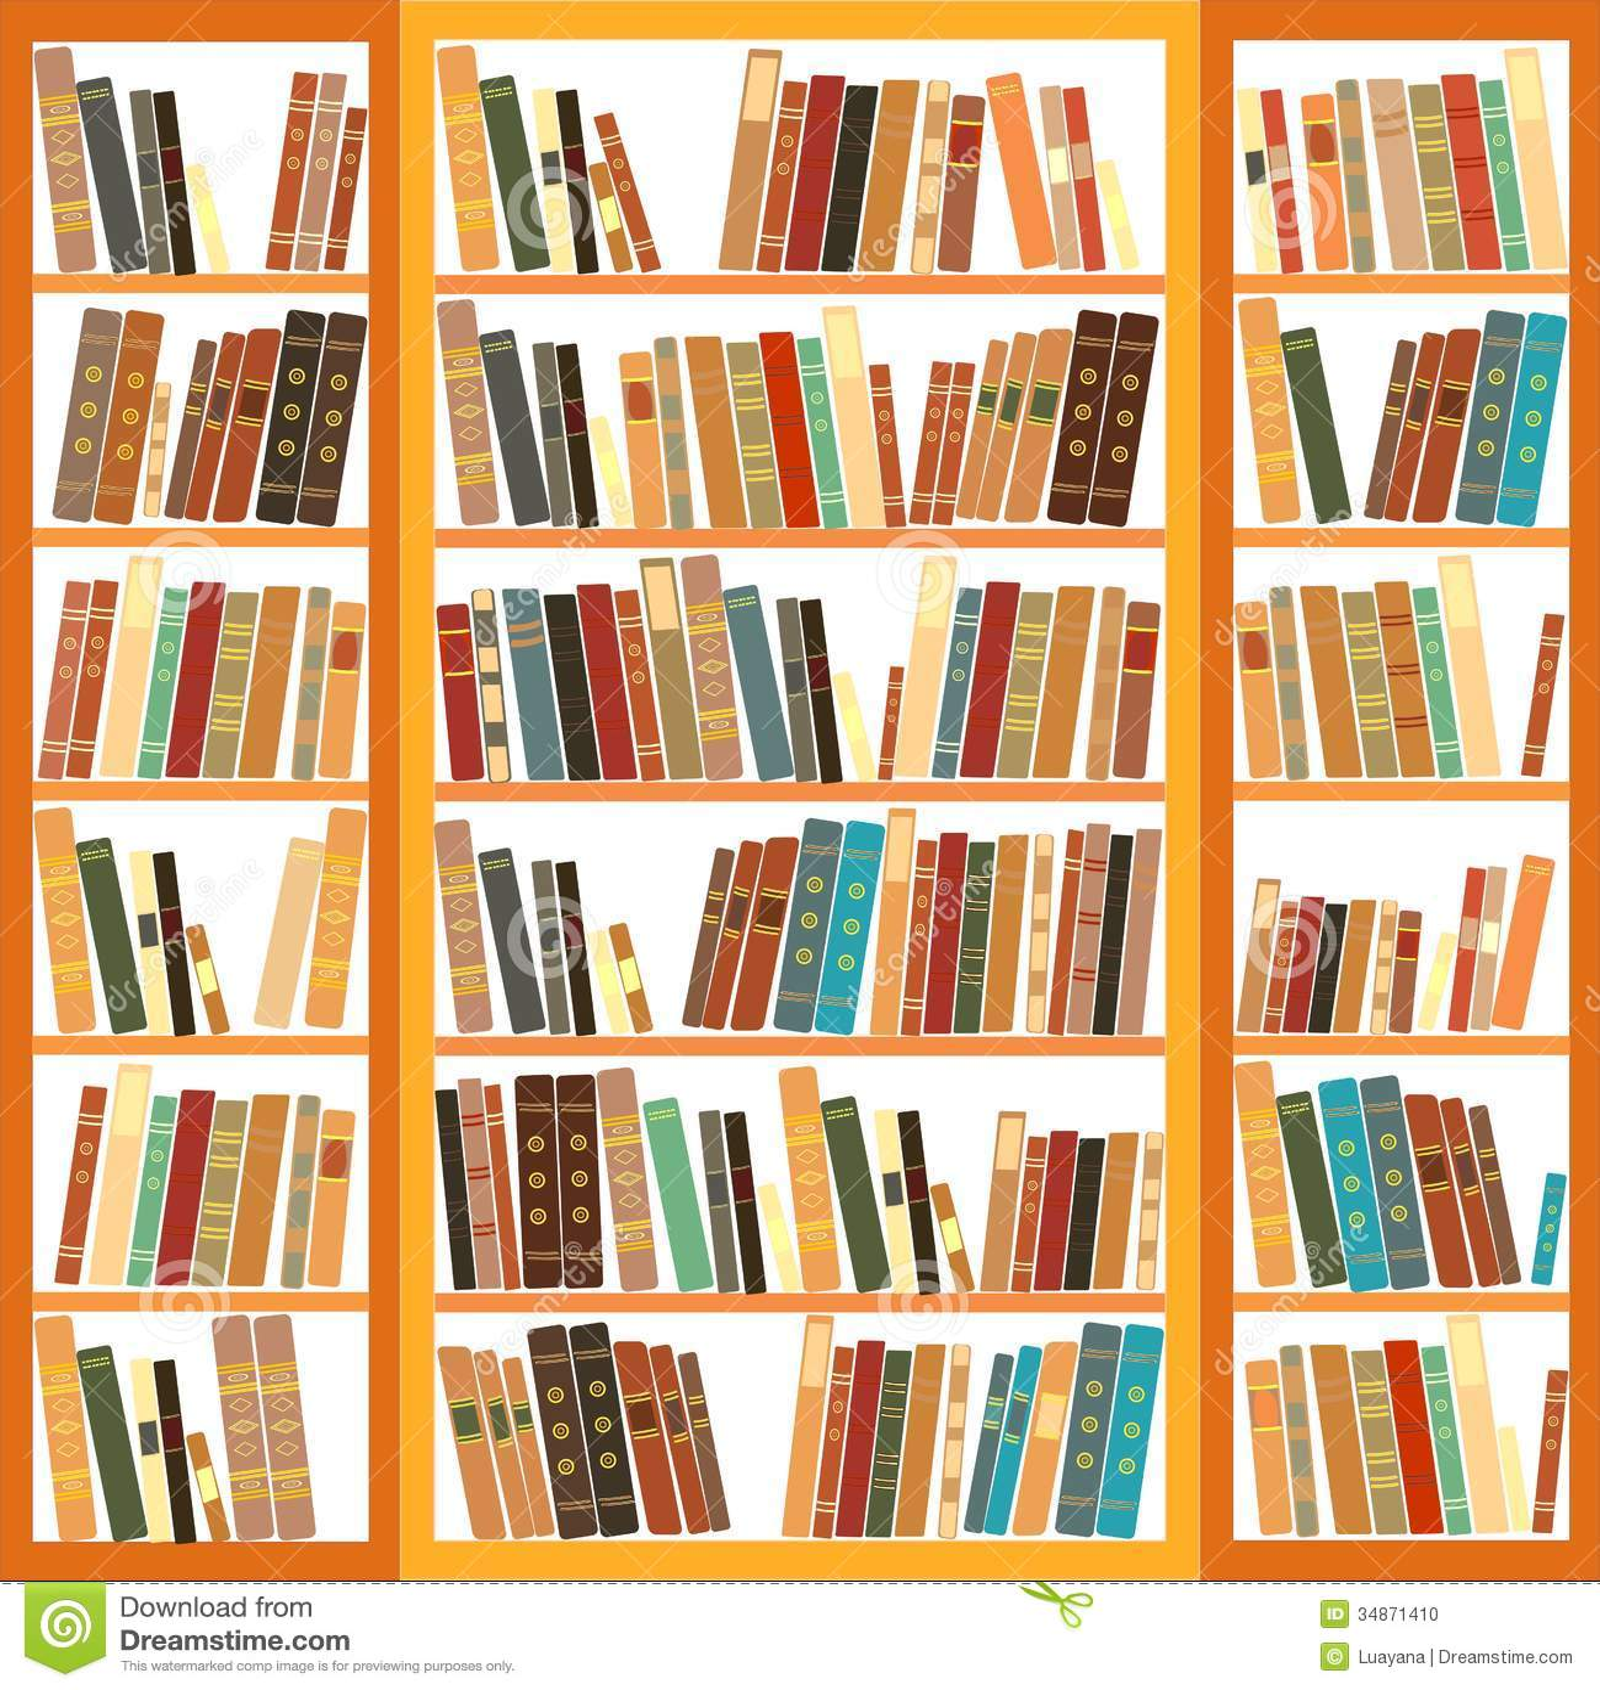 Bookcase full of books stock photo image classic